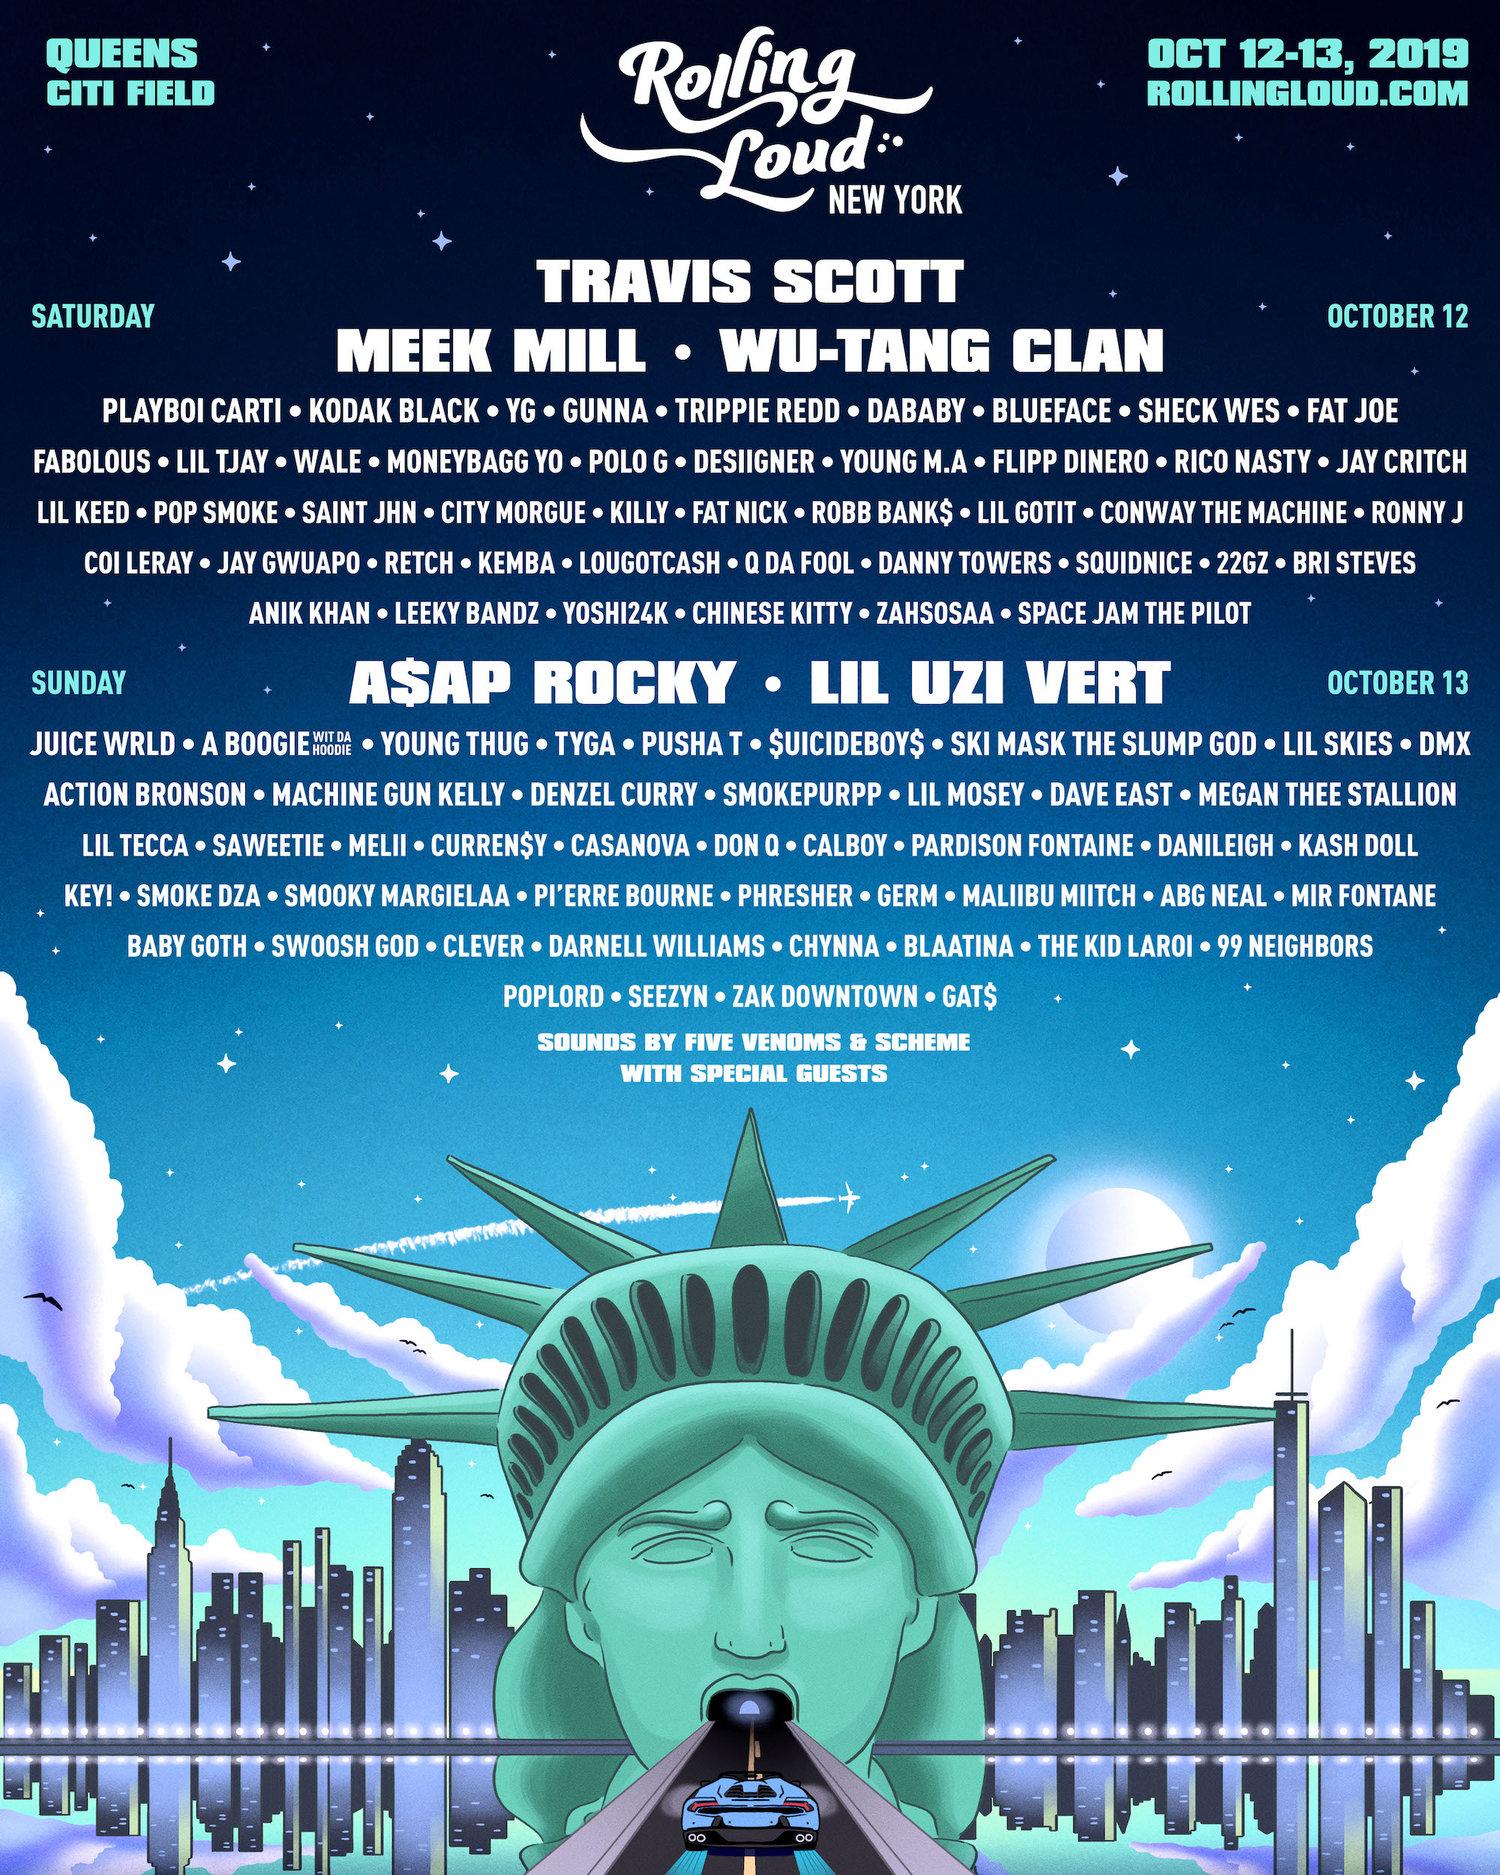 Rolling Loud NYC 2019